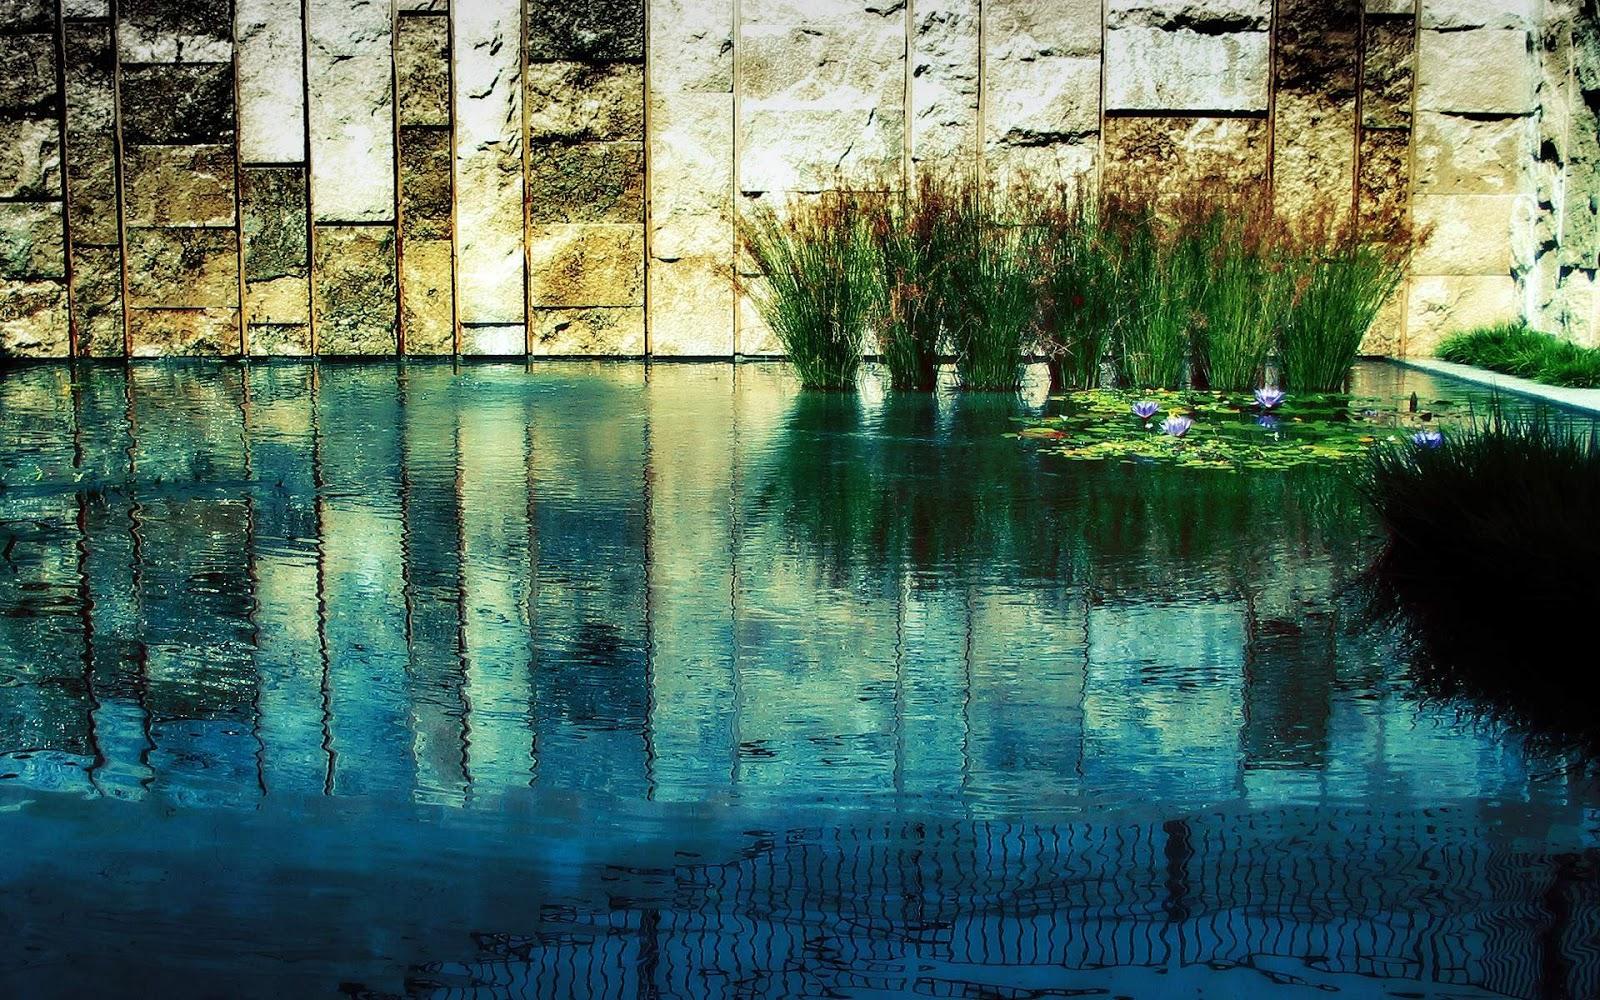 http://1.bp.blogspot.com/-ofLywZDF7us/UKwBIQBmZ-I/AAAAAAAABcA/JJTY2uhn364/s1600/Earth+Water+Reflection+Wallpaper+hd.jpg